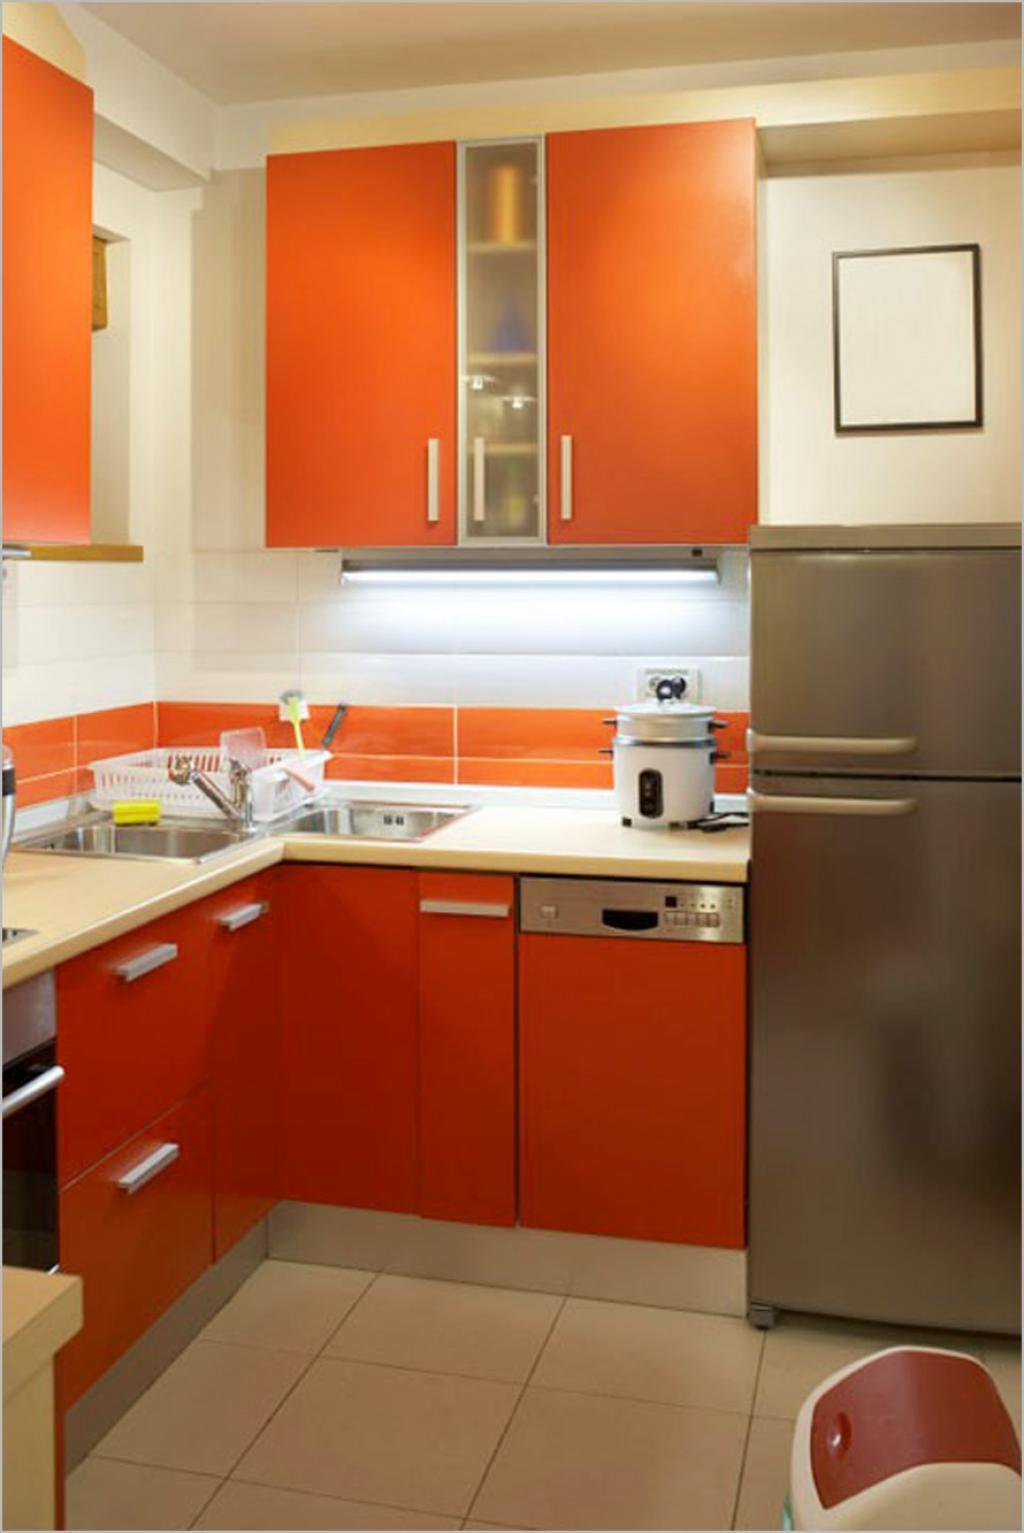 21 cool small kitchen design ideas | kitchen | pinterest | kitchen